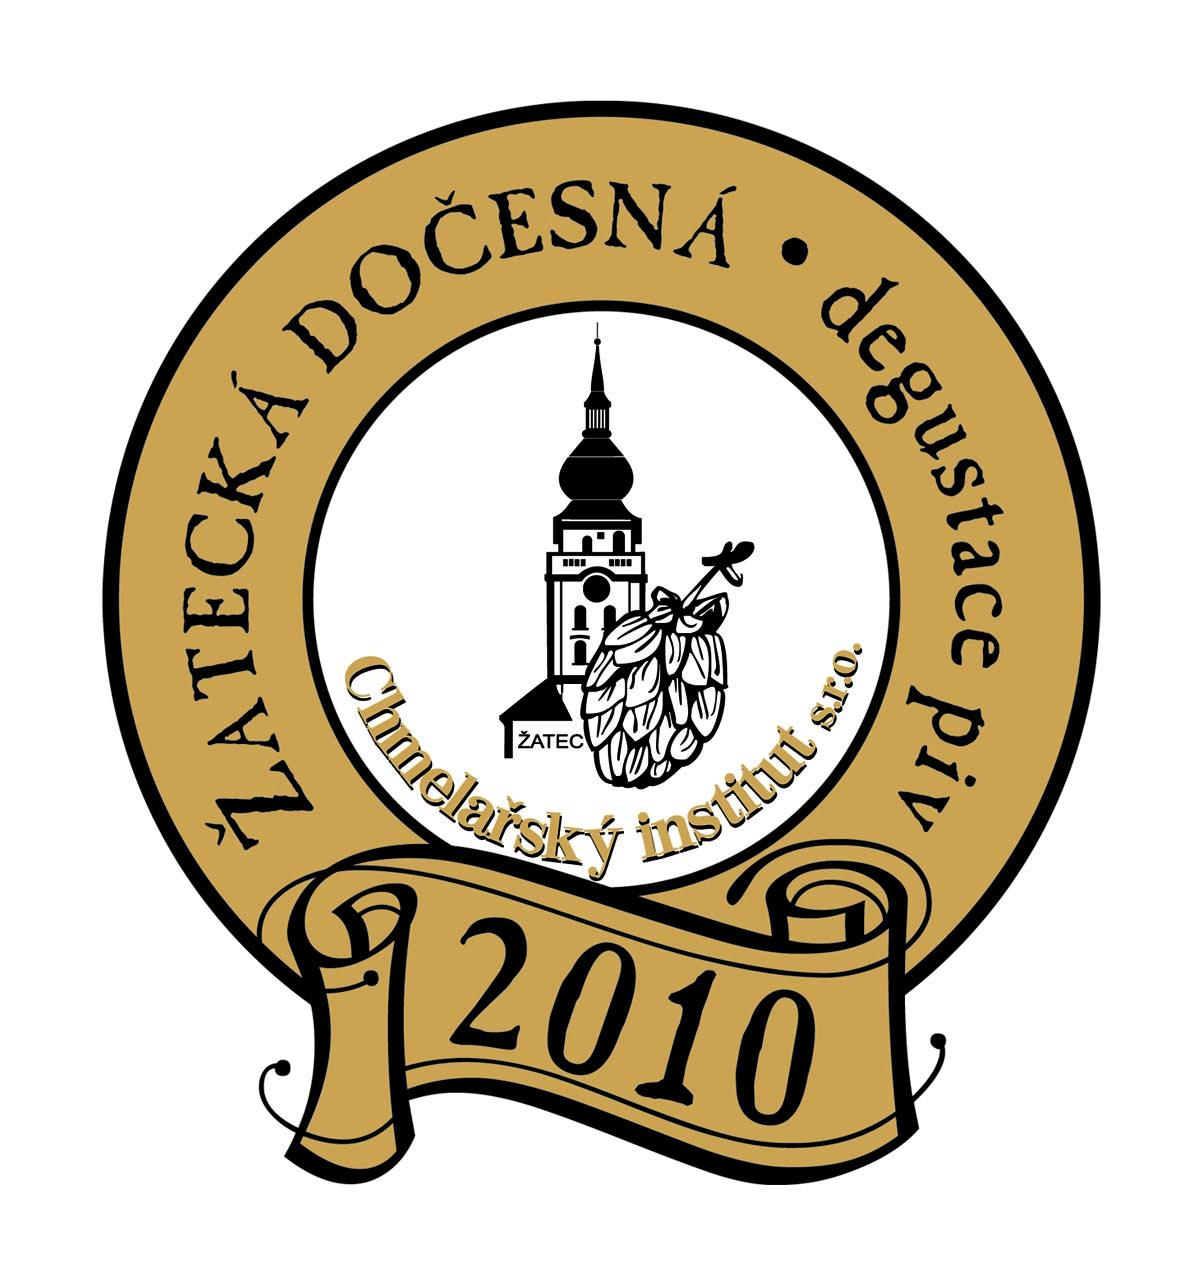 https://primator.cz/wp-content/uploads/2018/03/Dočesná-2010_logo.jpg